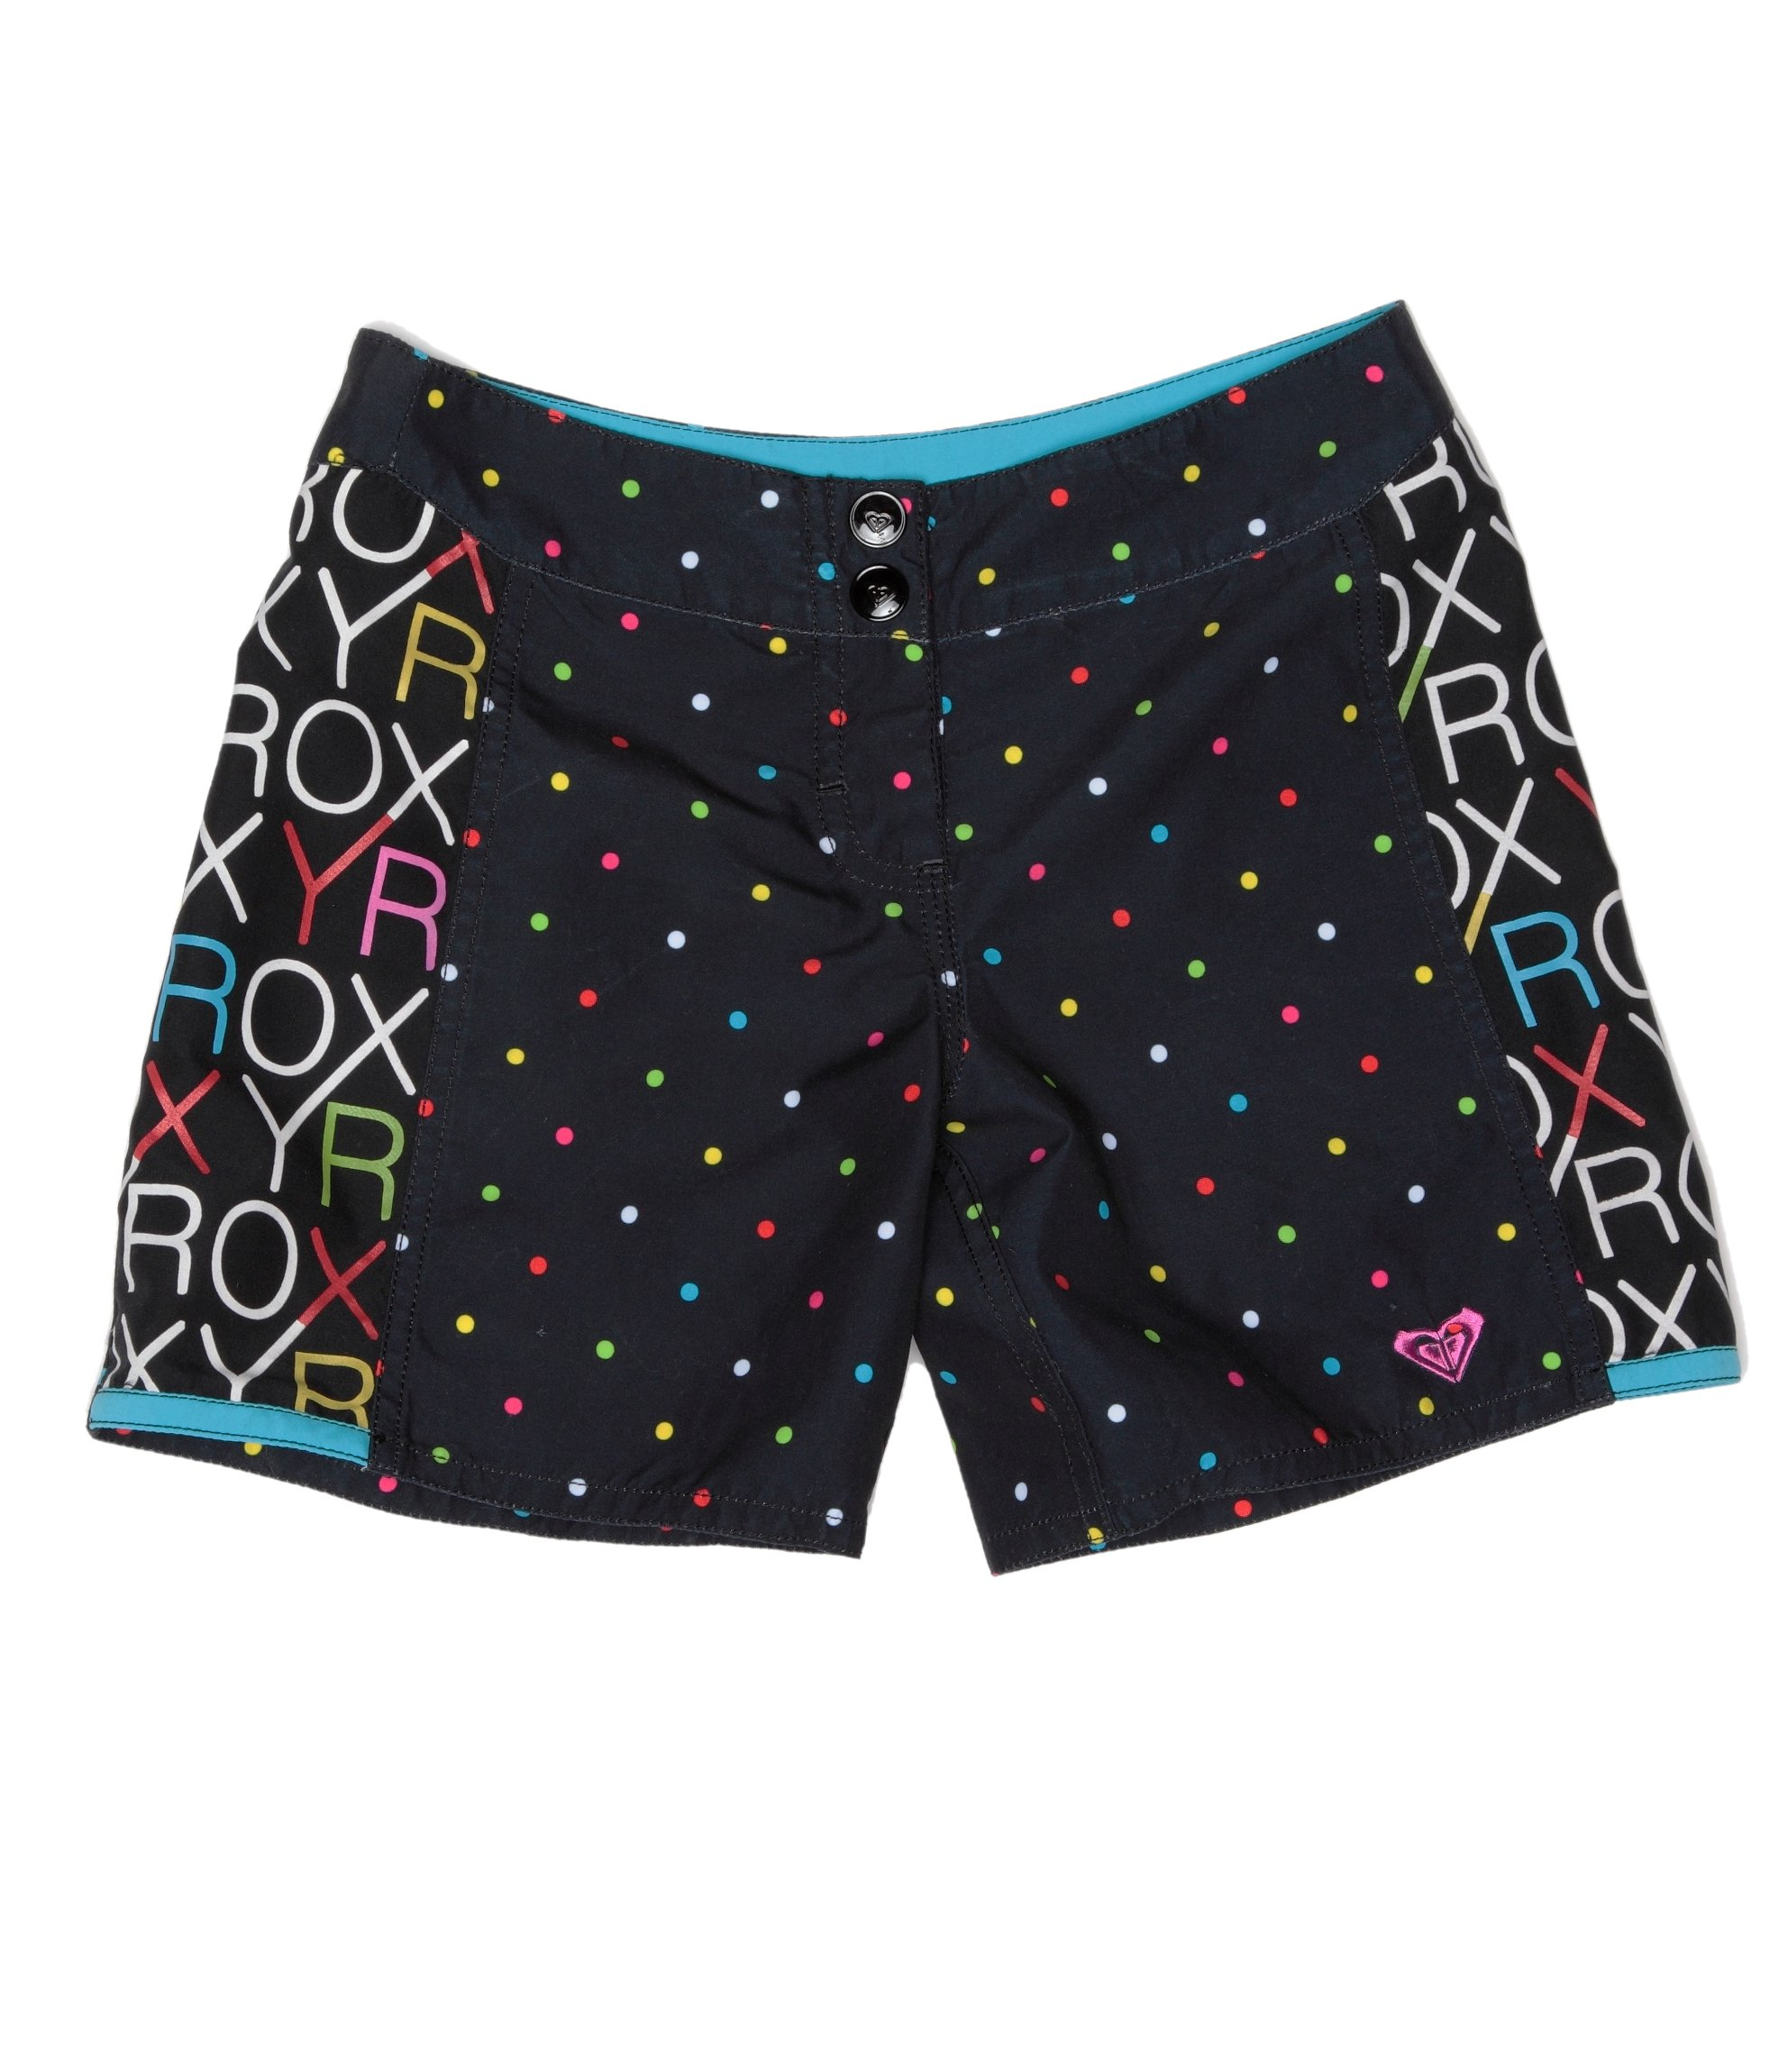 Roxy - XITBS074/RAINBOW, Pantaloncini da surf da ragazza, Stampa (Rainbow Black), 152